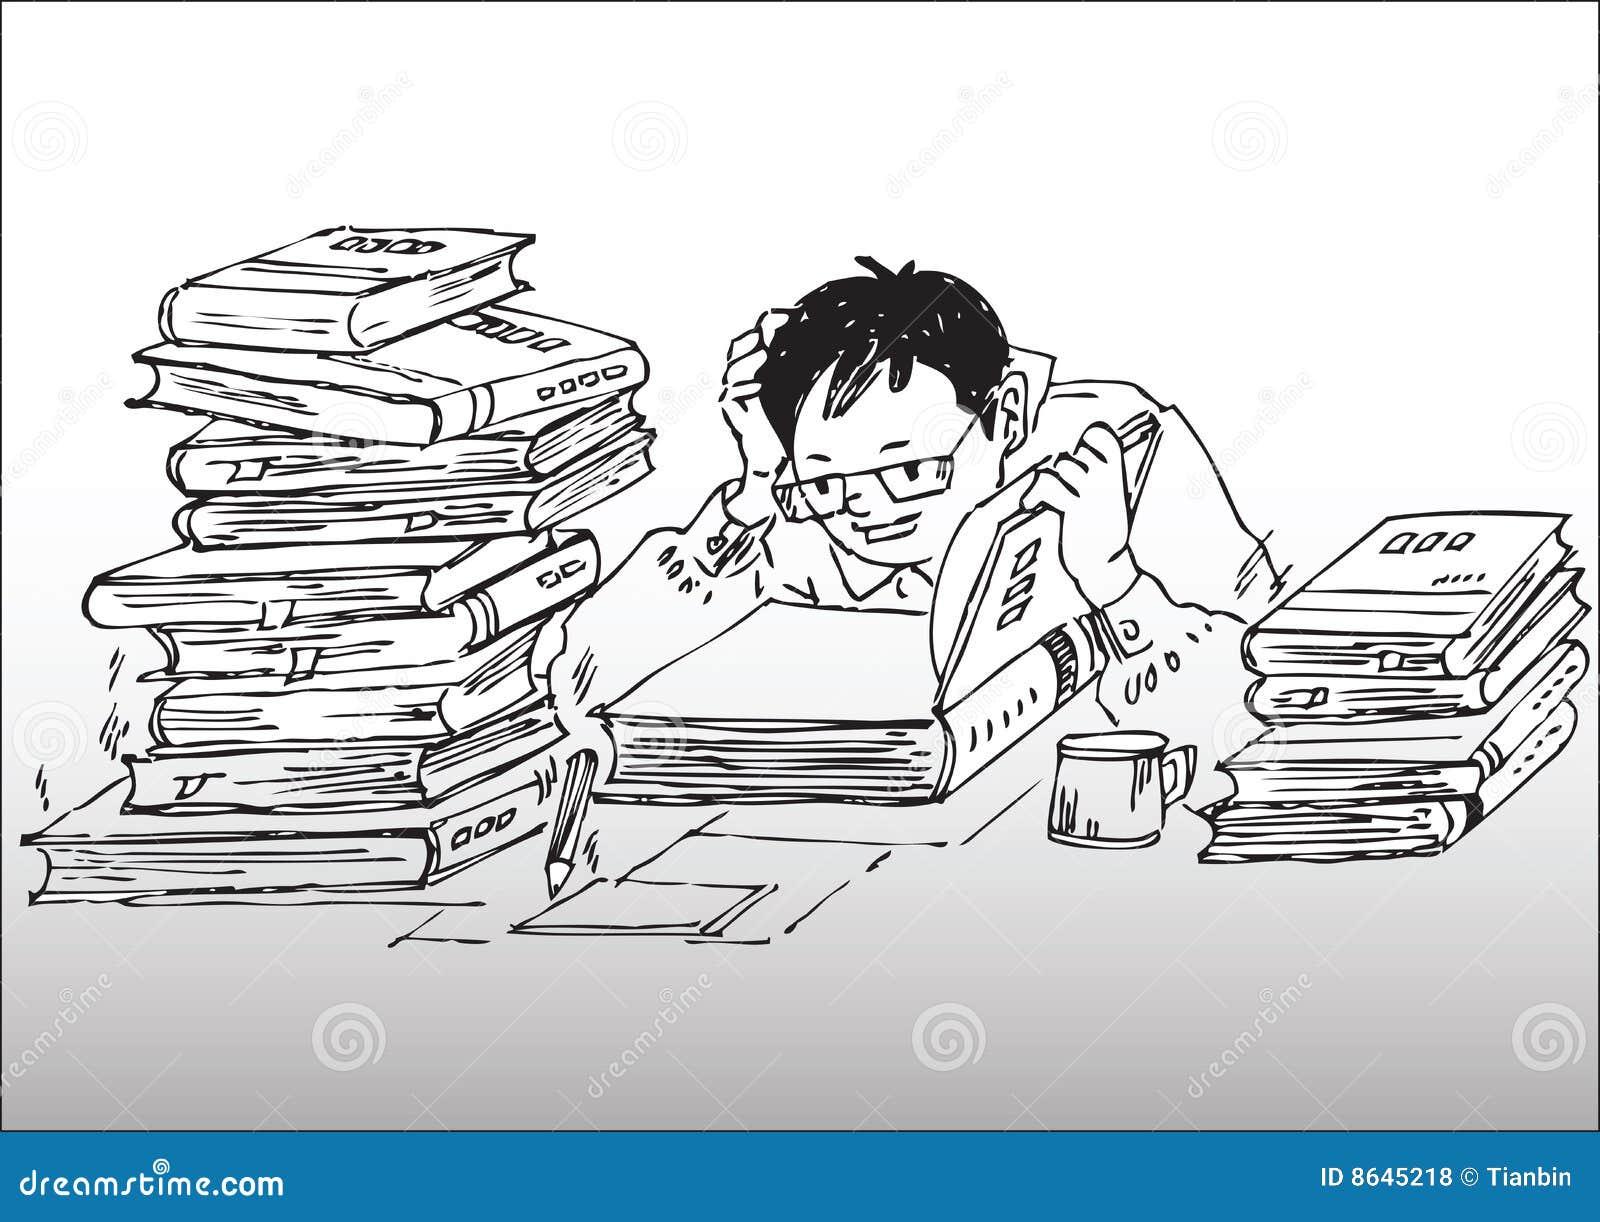 Cartoon Studying Working Hard Royalty Free Stock Photos